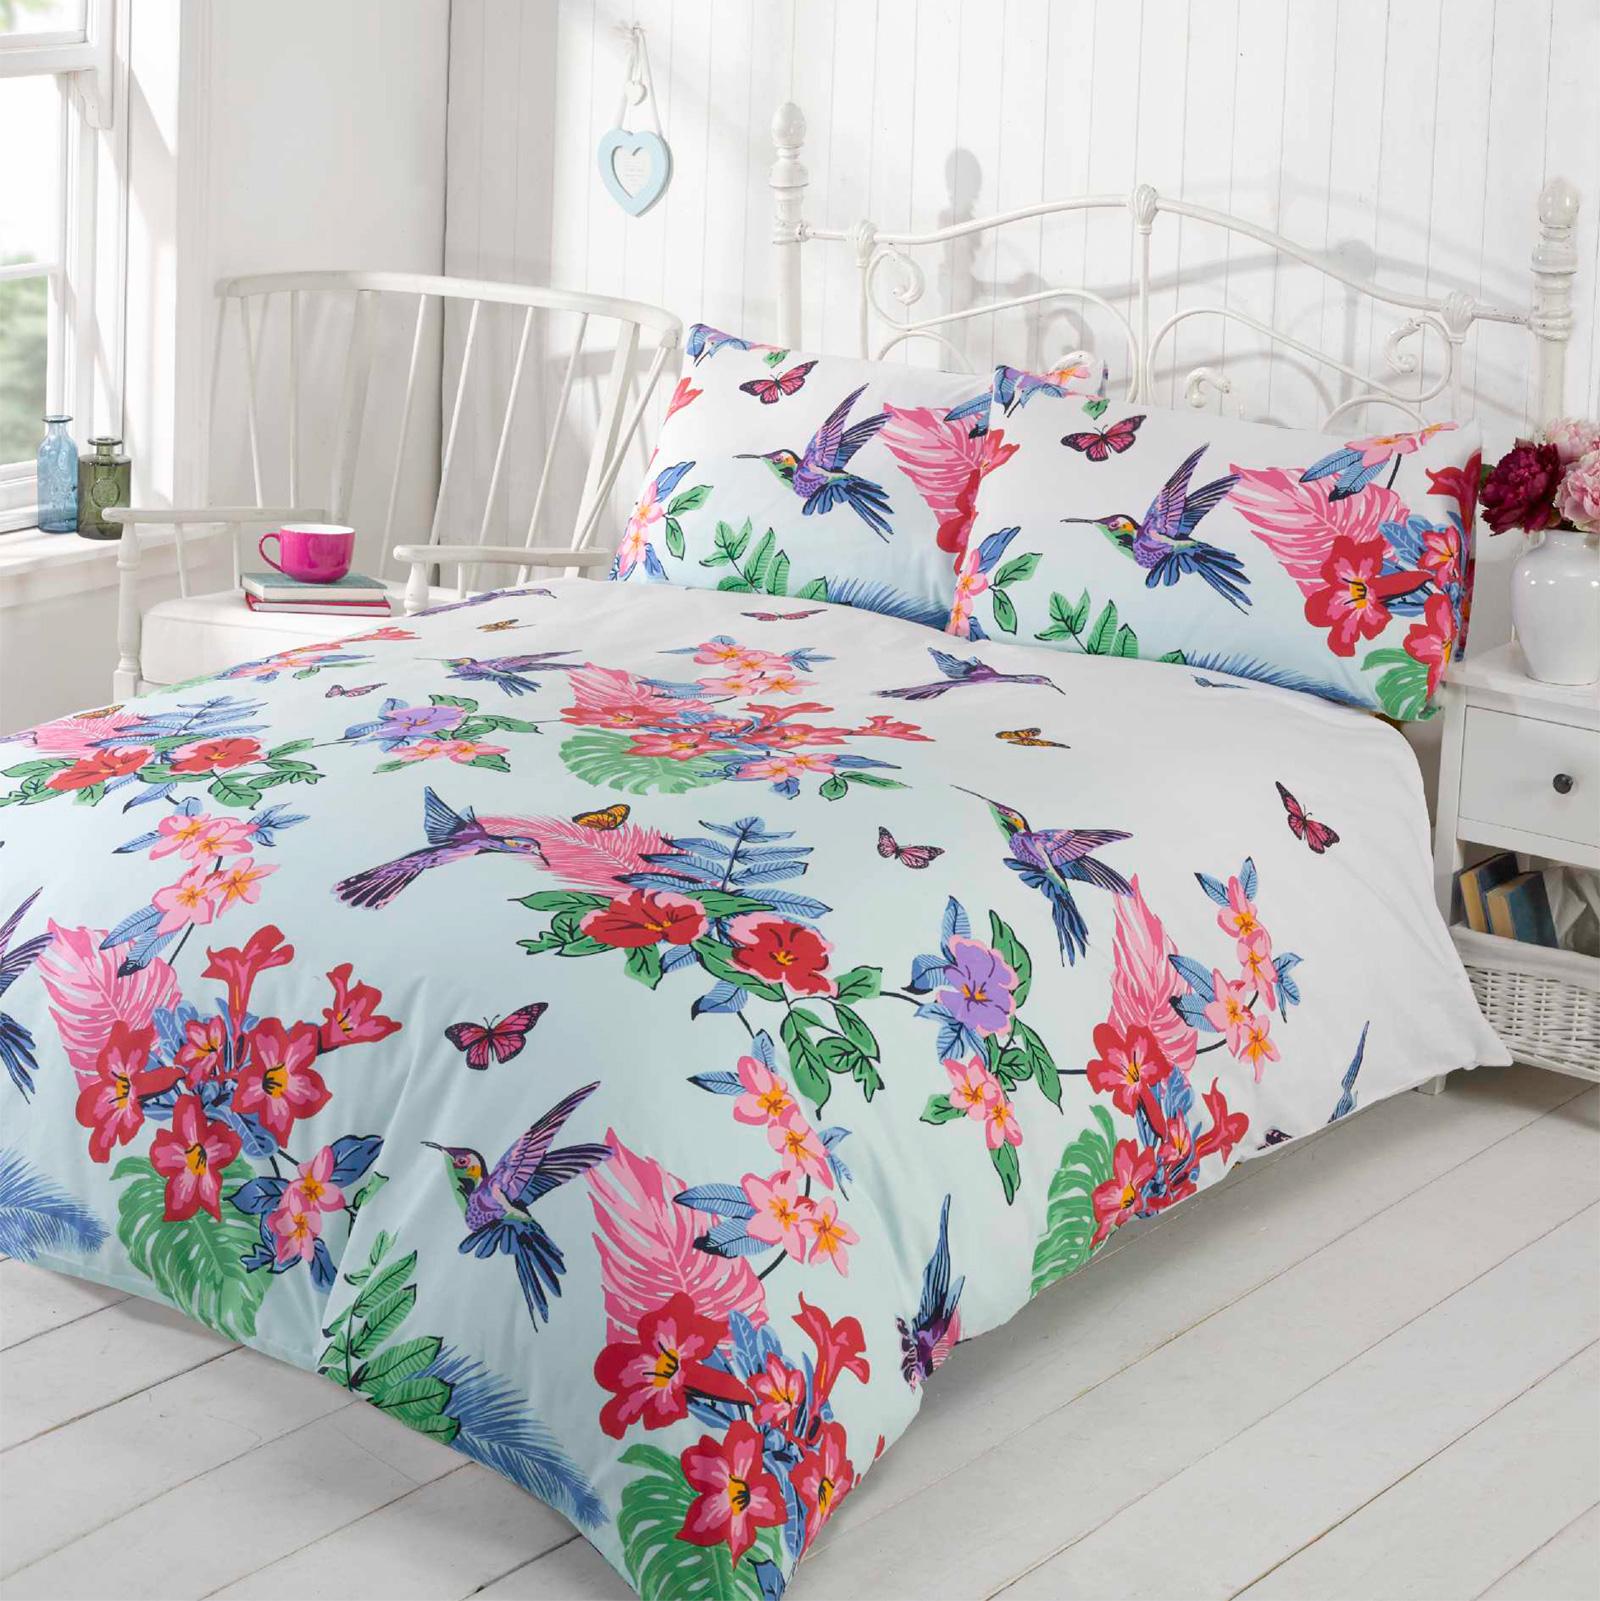 tropical nature humming birds duvet cover set with pretty flowers  - tropicalnaturehummingbirdsduvetcoversetwith